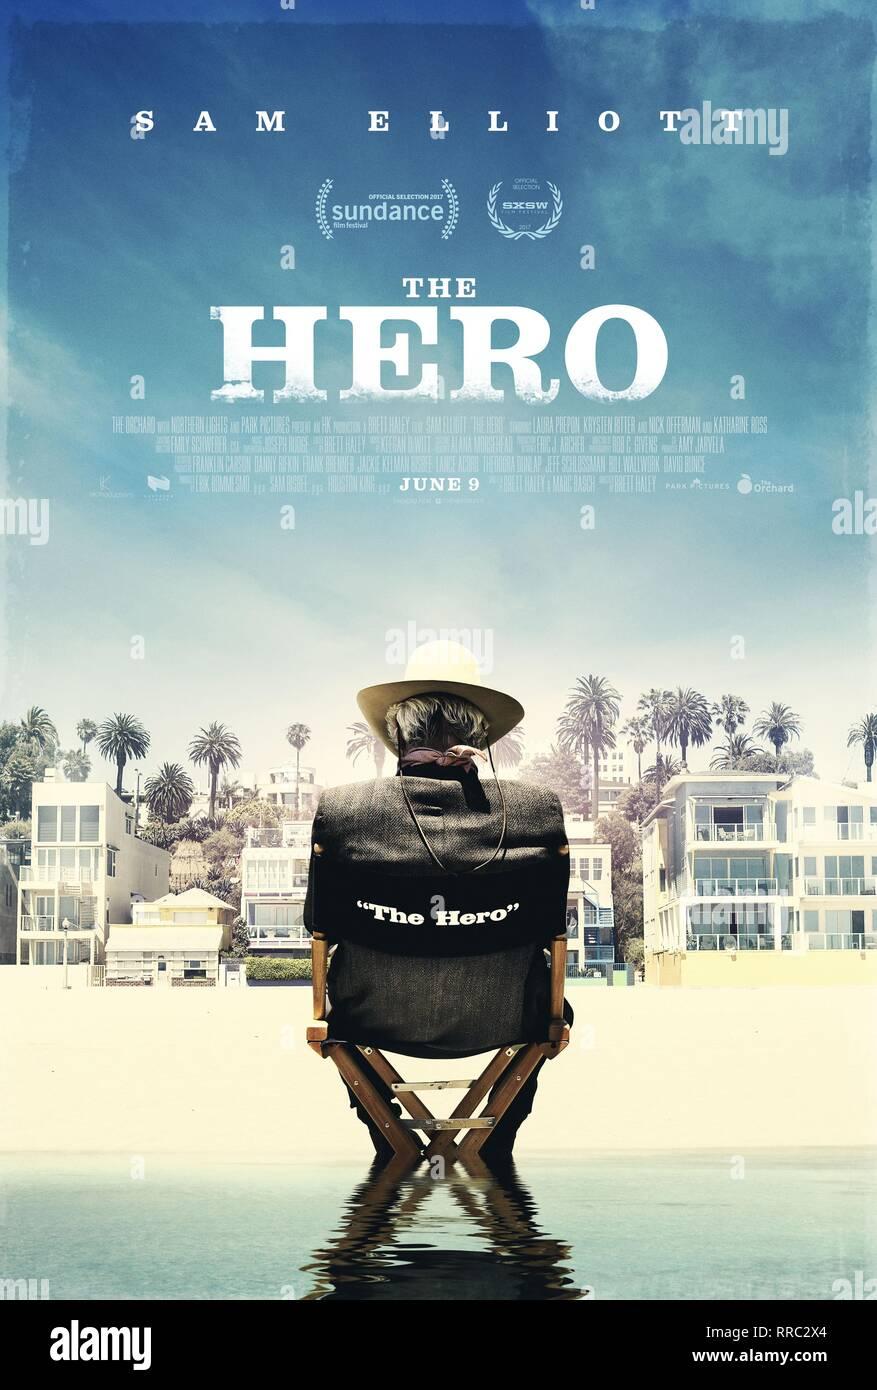 THE HERO, MOVIE POSTER, 2017 - Stock Image